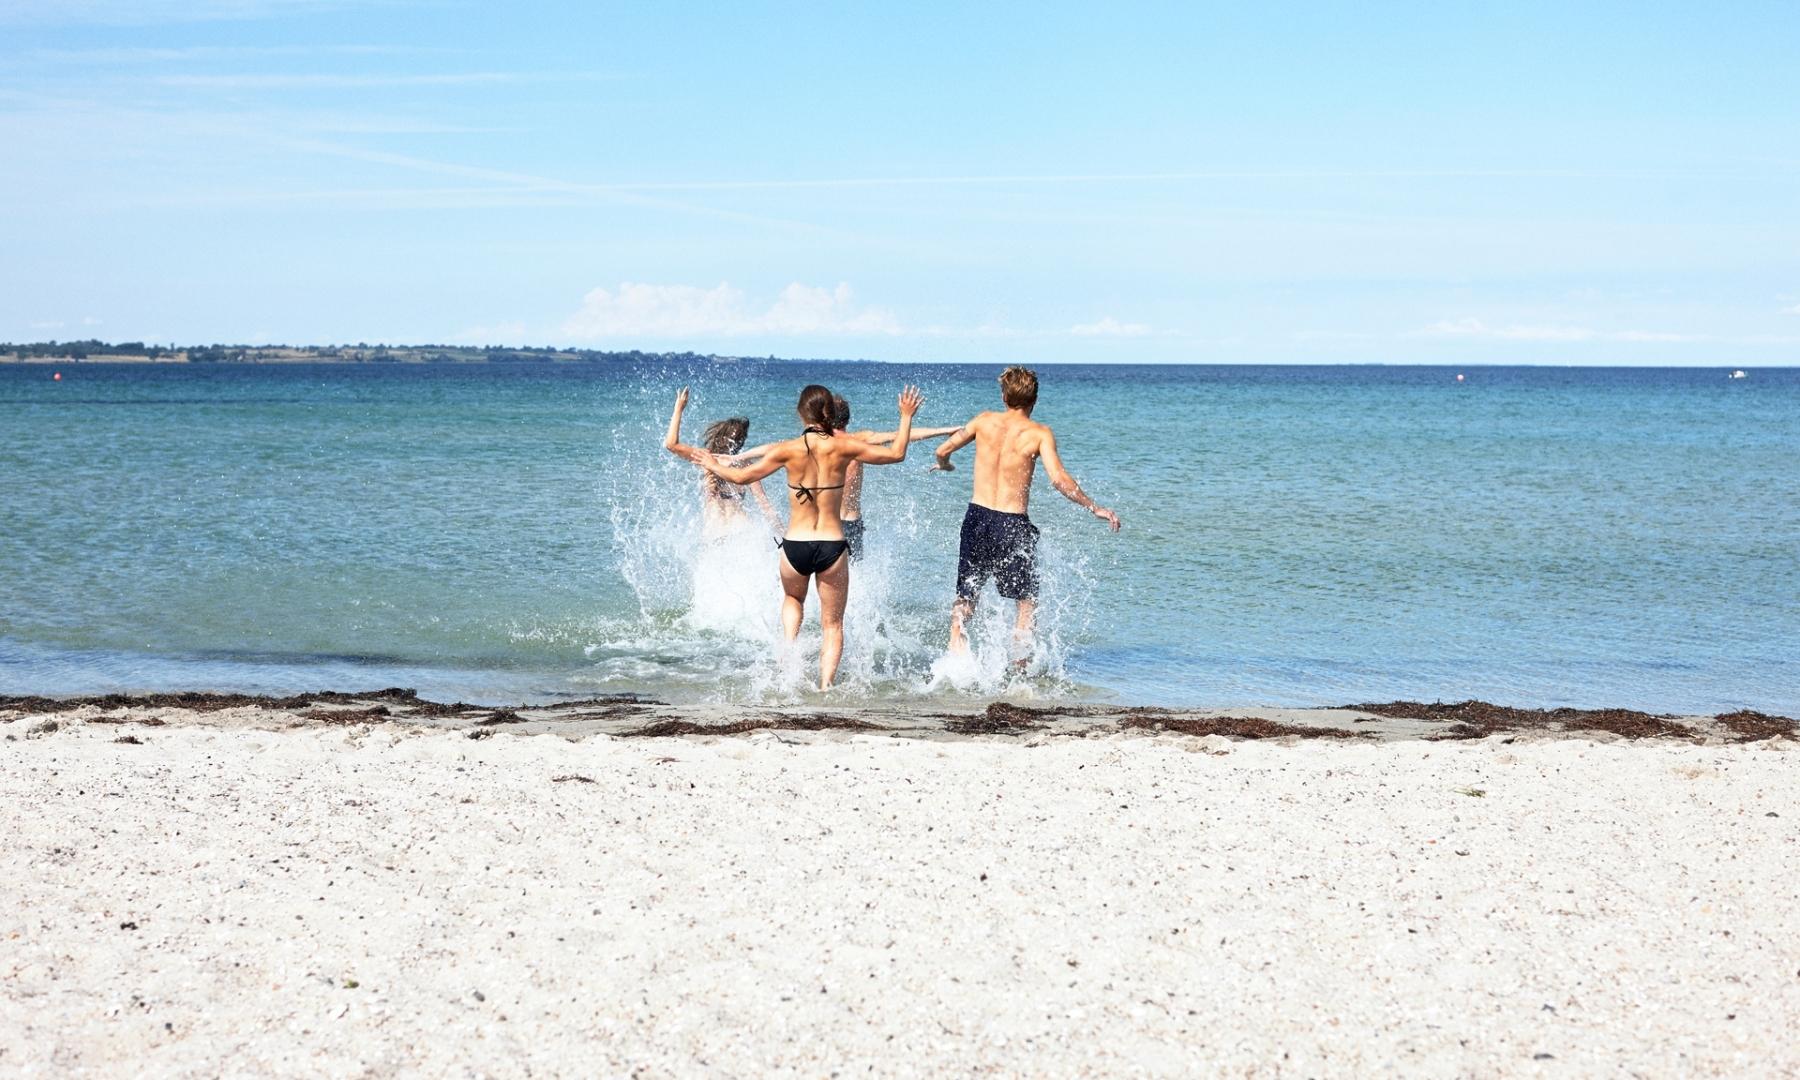 Waar wil je naar toe in Denemarken?